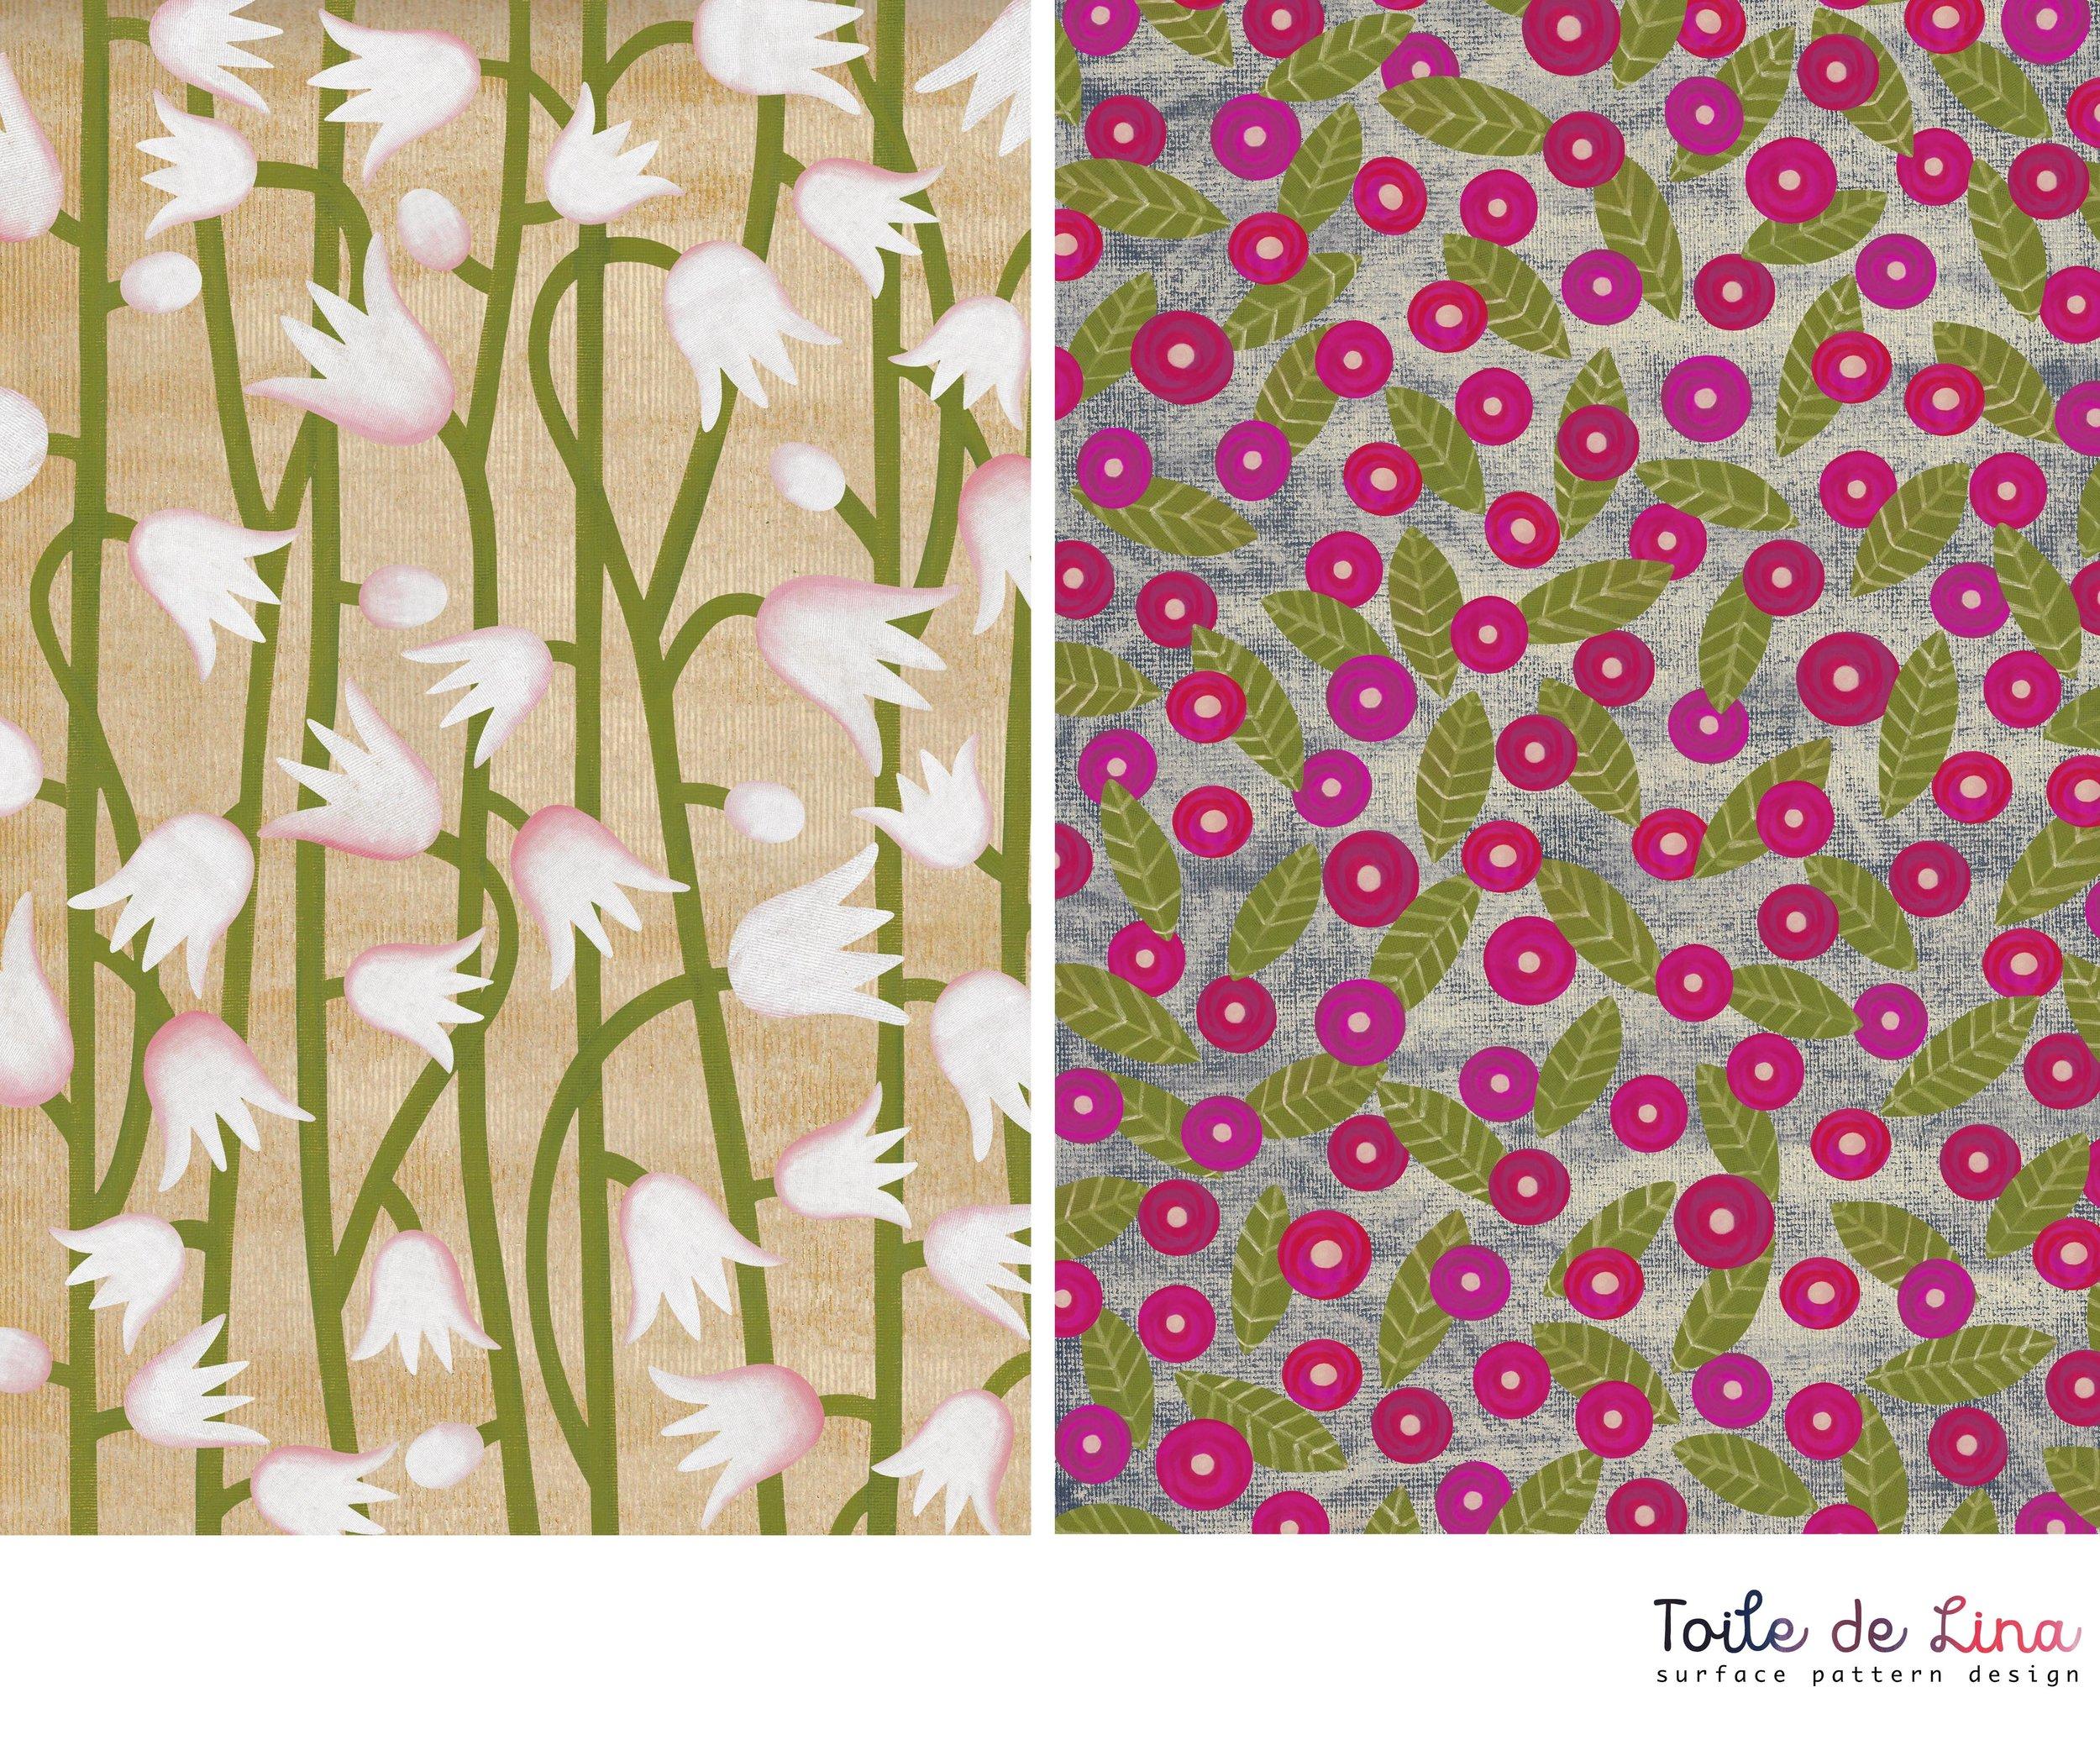 dry pastel florals.jpg